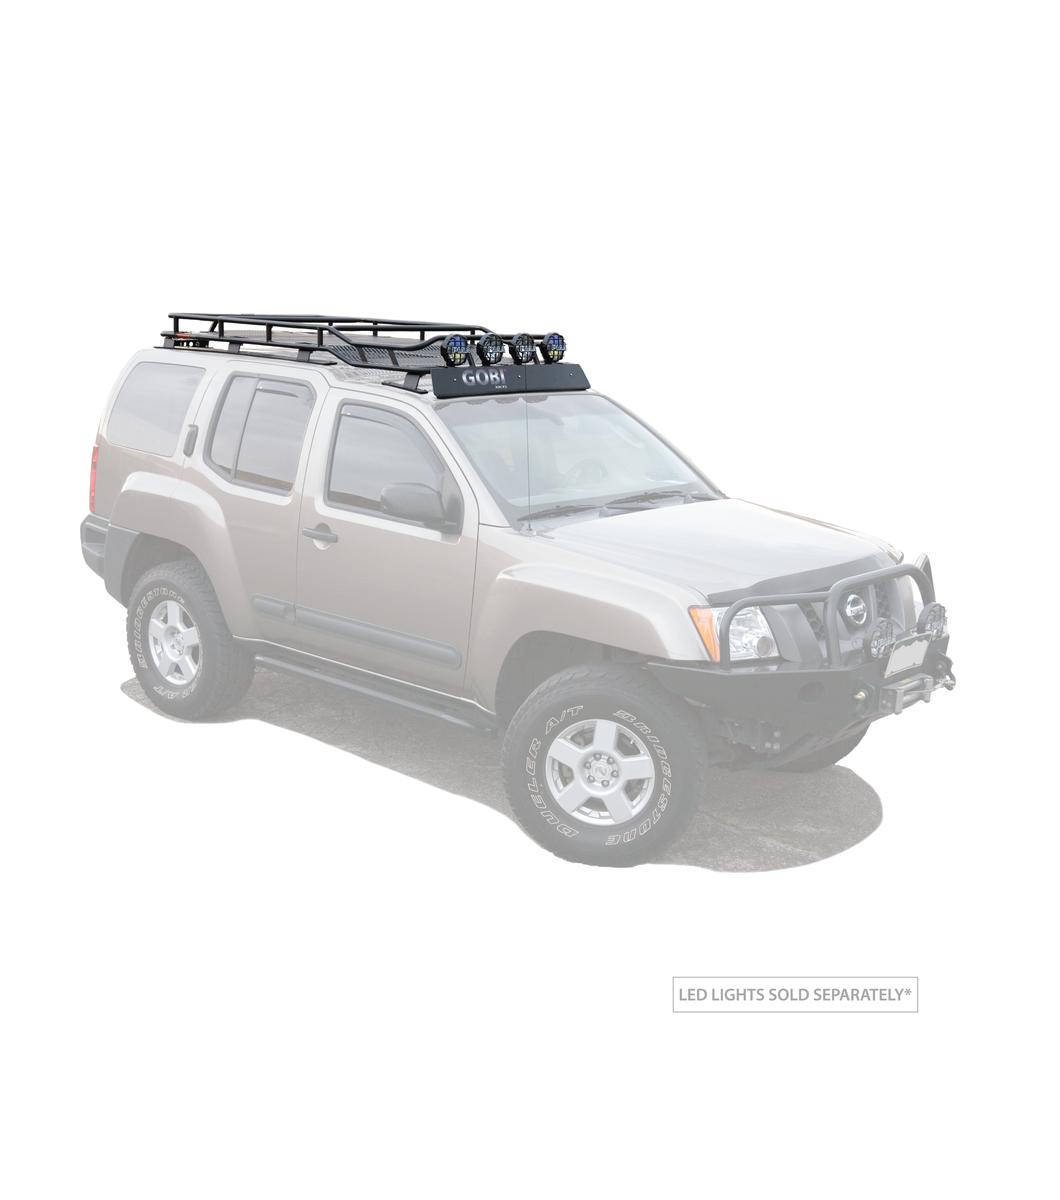 GOBI Nissan Xterra Ranger Rack. Webp.net-resizeimage-363